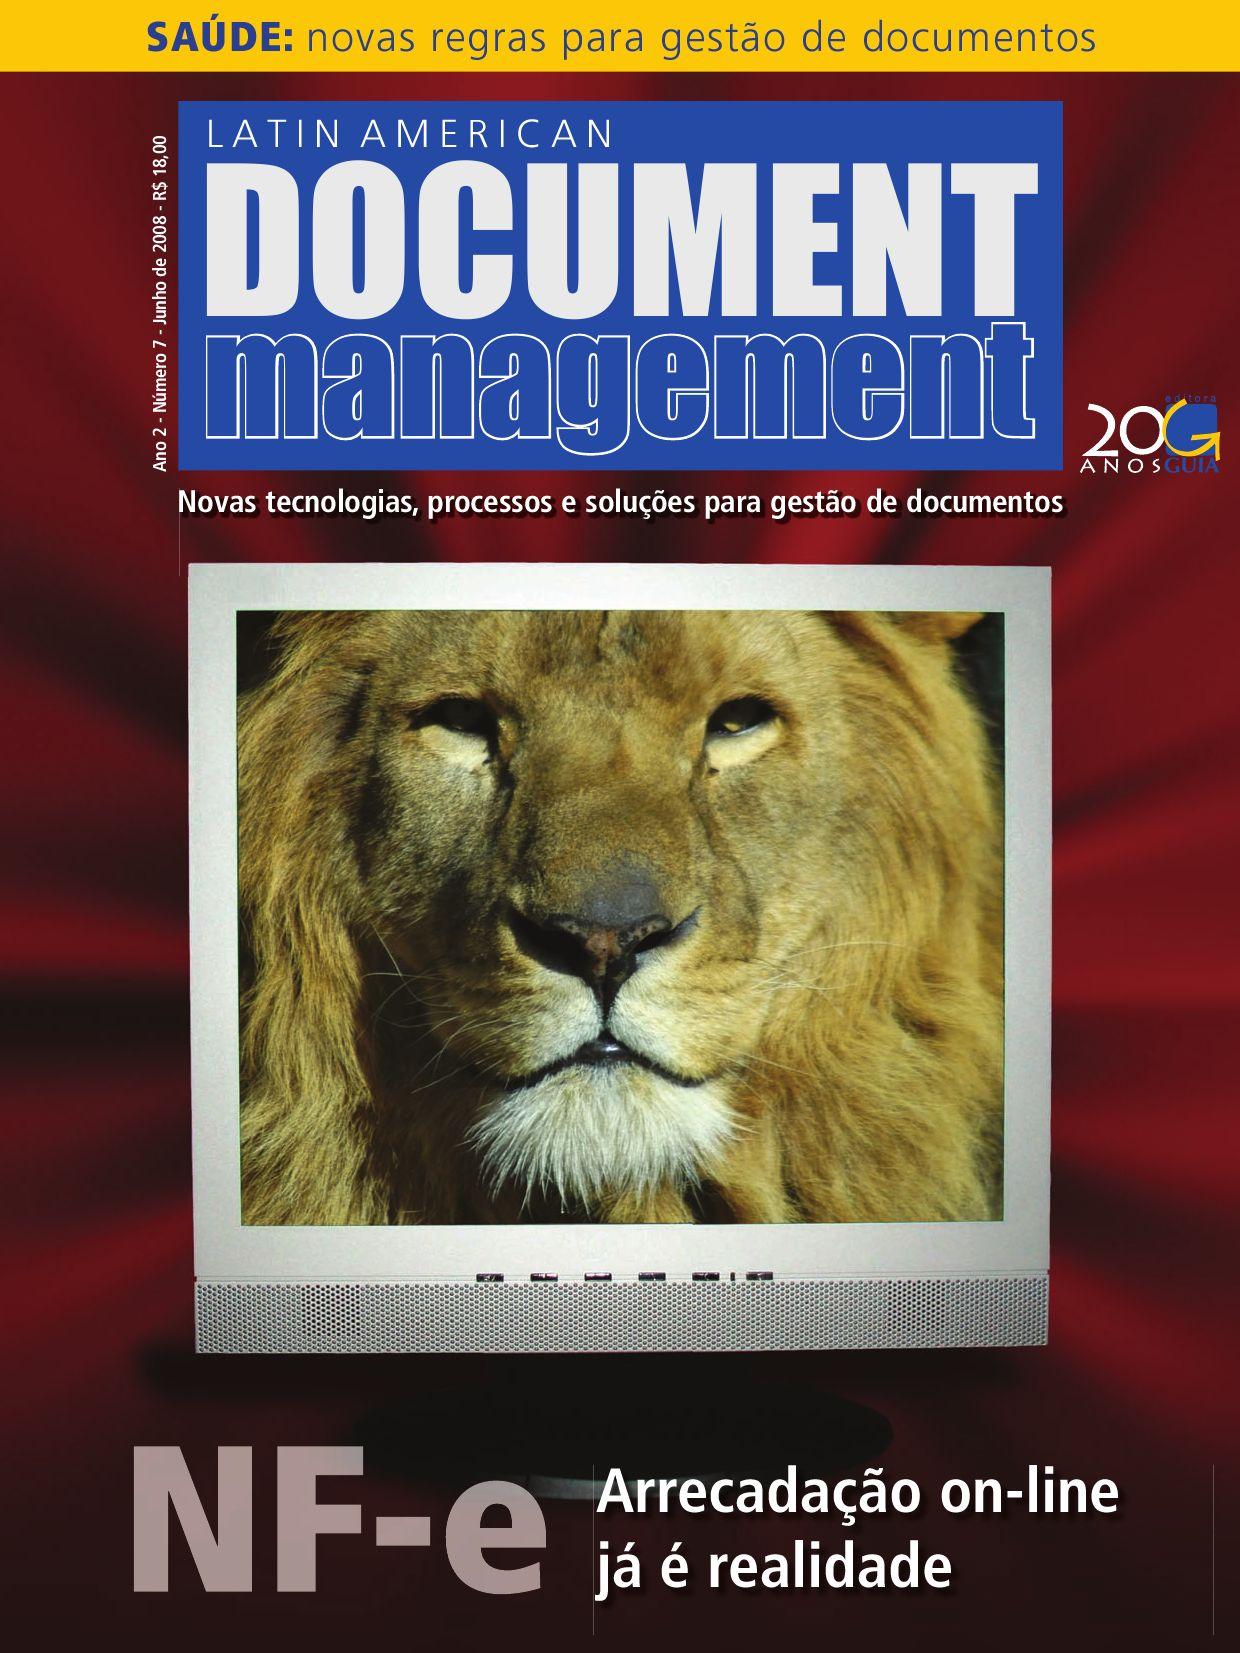 Document Management 07 By Editora Guia Issuu